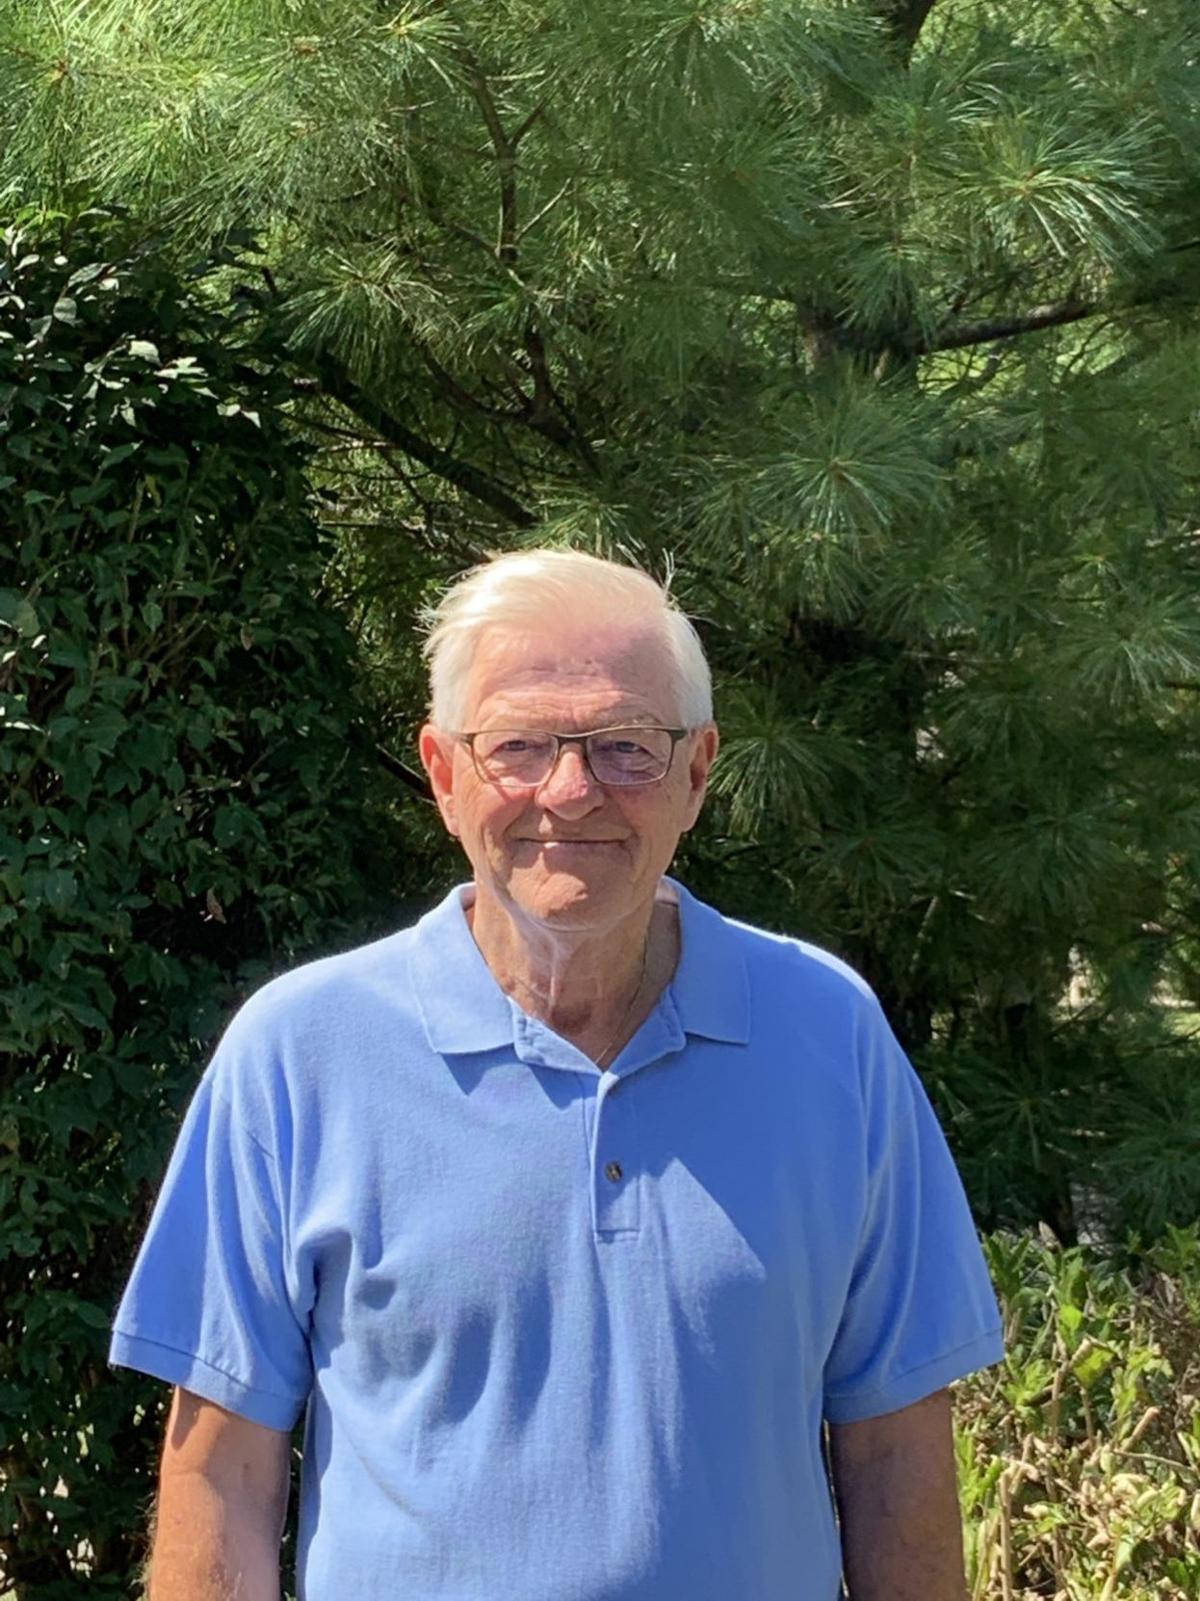 Democratic Ocean County Sheriff Candidate Gene Davis